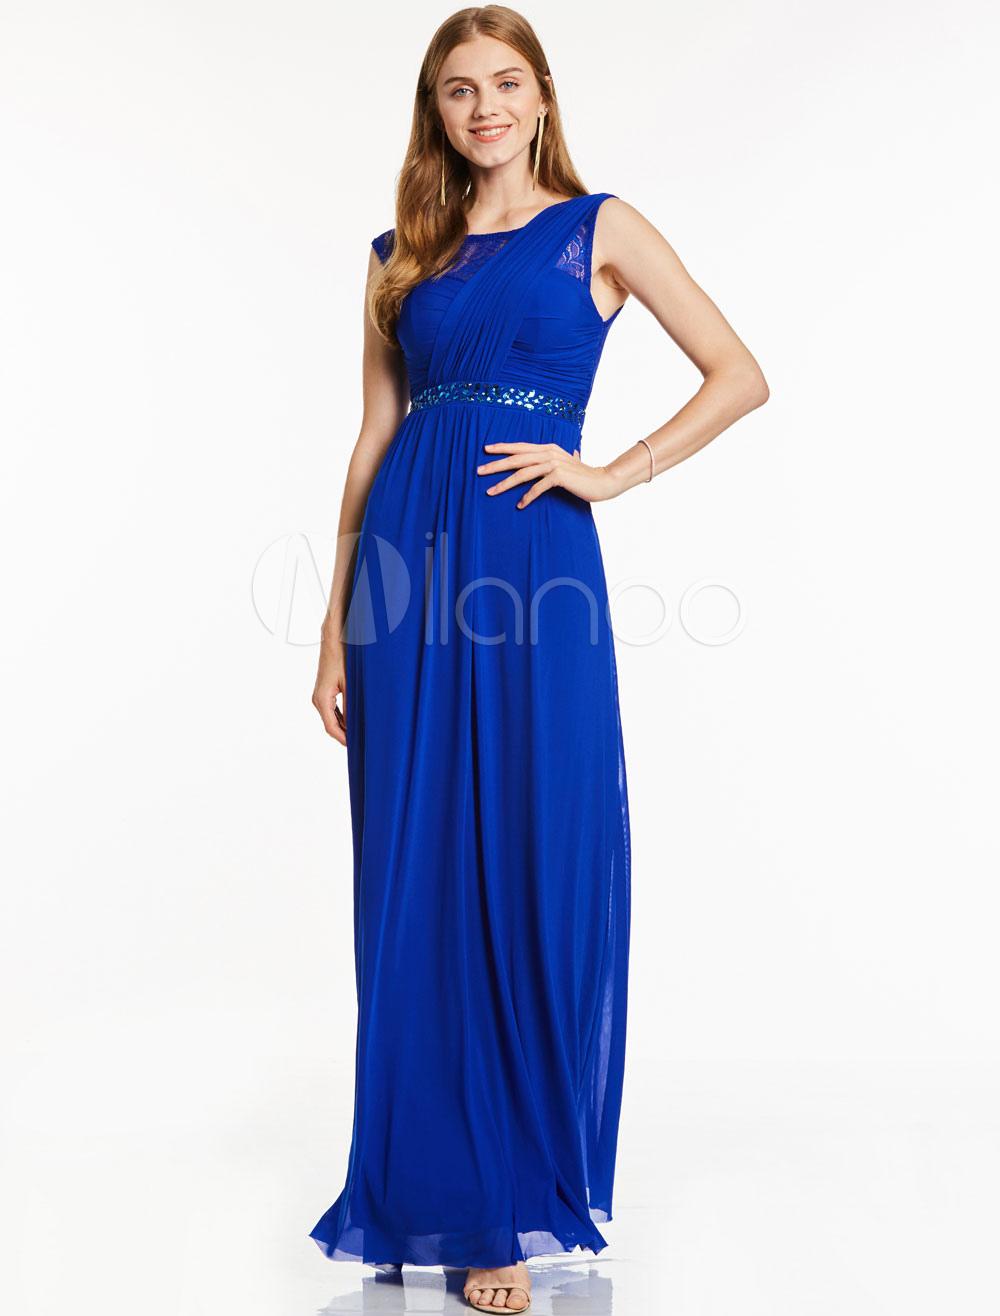 Prom Dresses Long Royal Blue Beading Sash Sleeveless Chiffon Floor Length Party Dress (Wedding Cheap Party Dress) photo